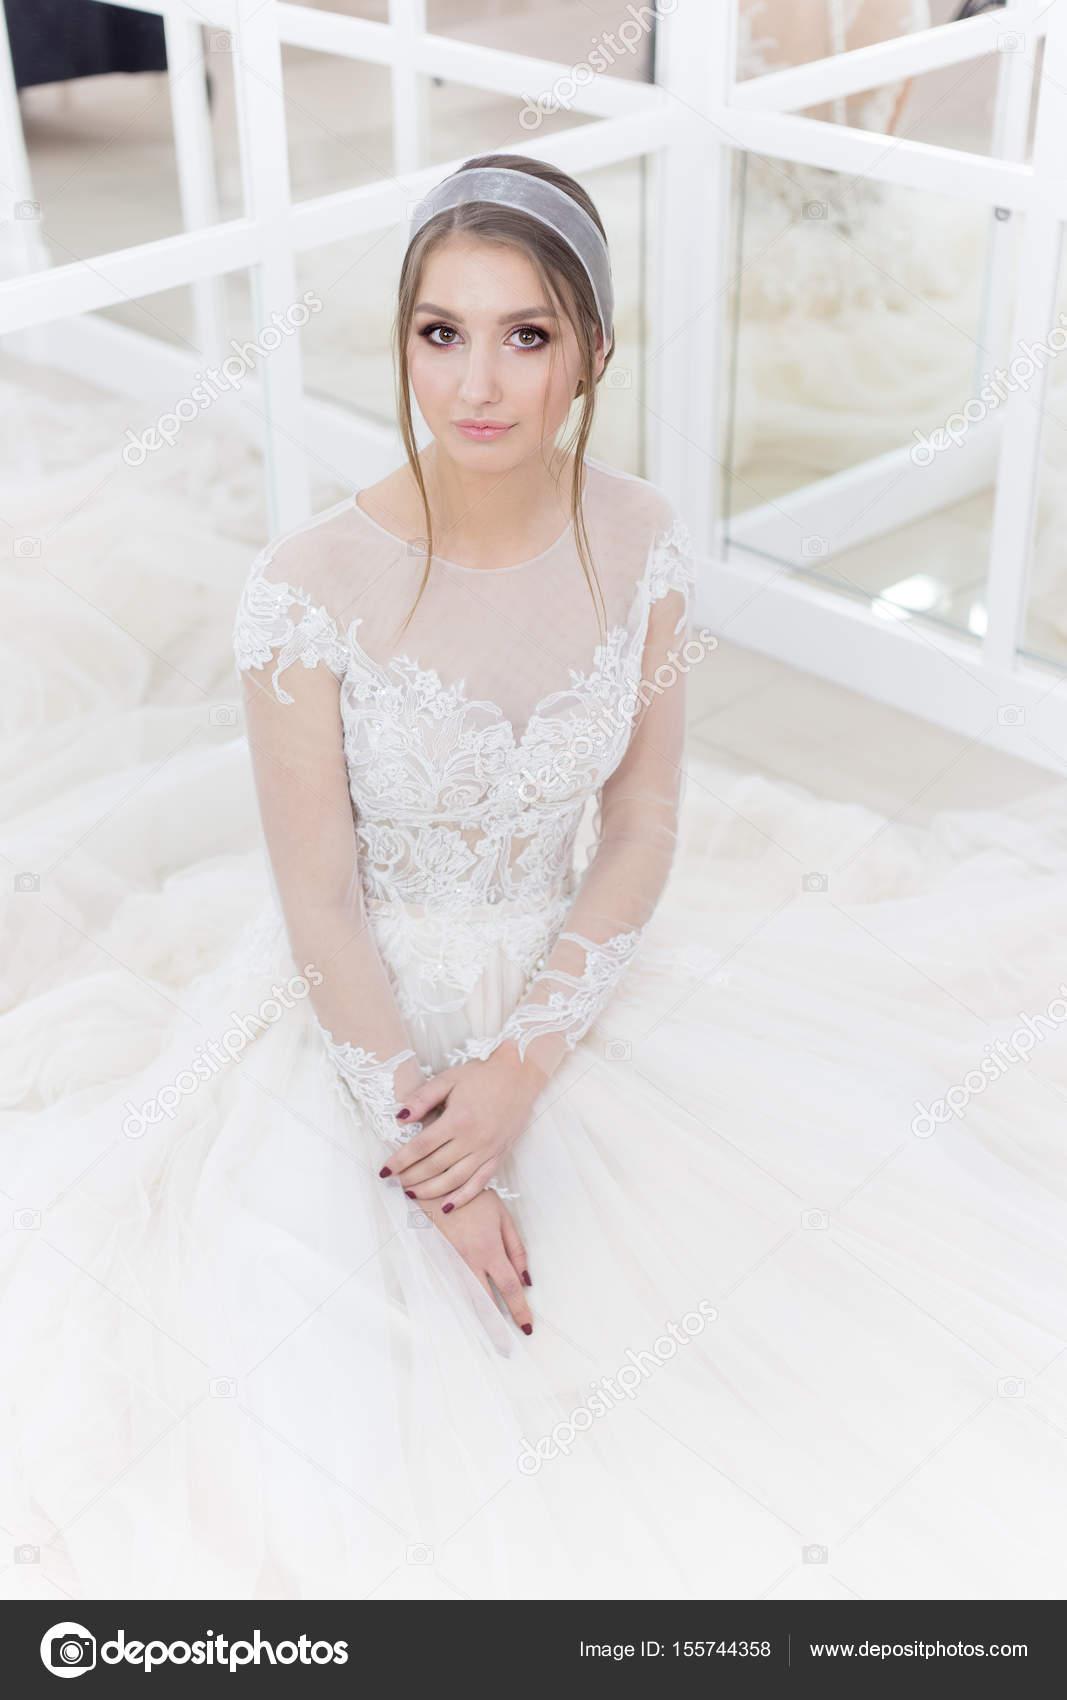 Beautiful cute tender young girl bride in wedding dress in mirrors ...